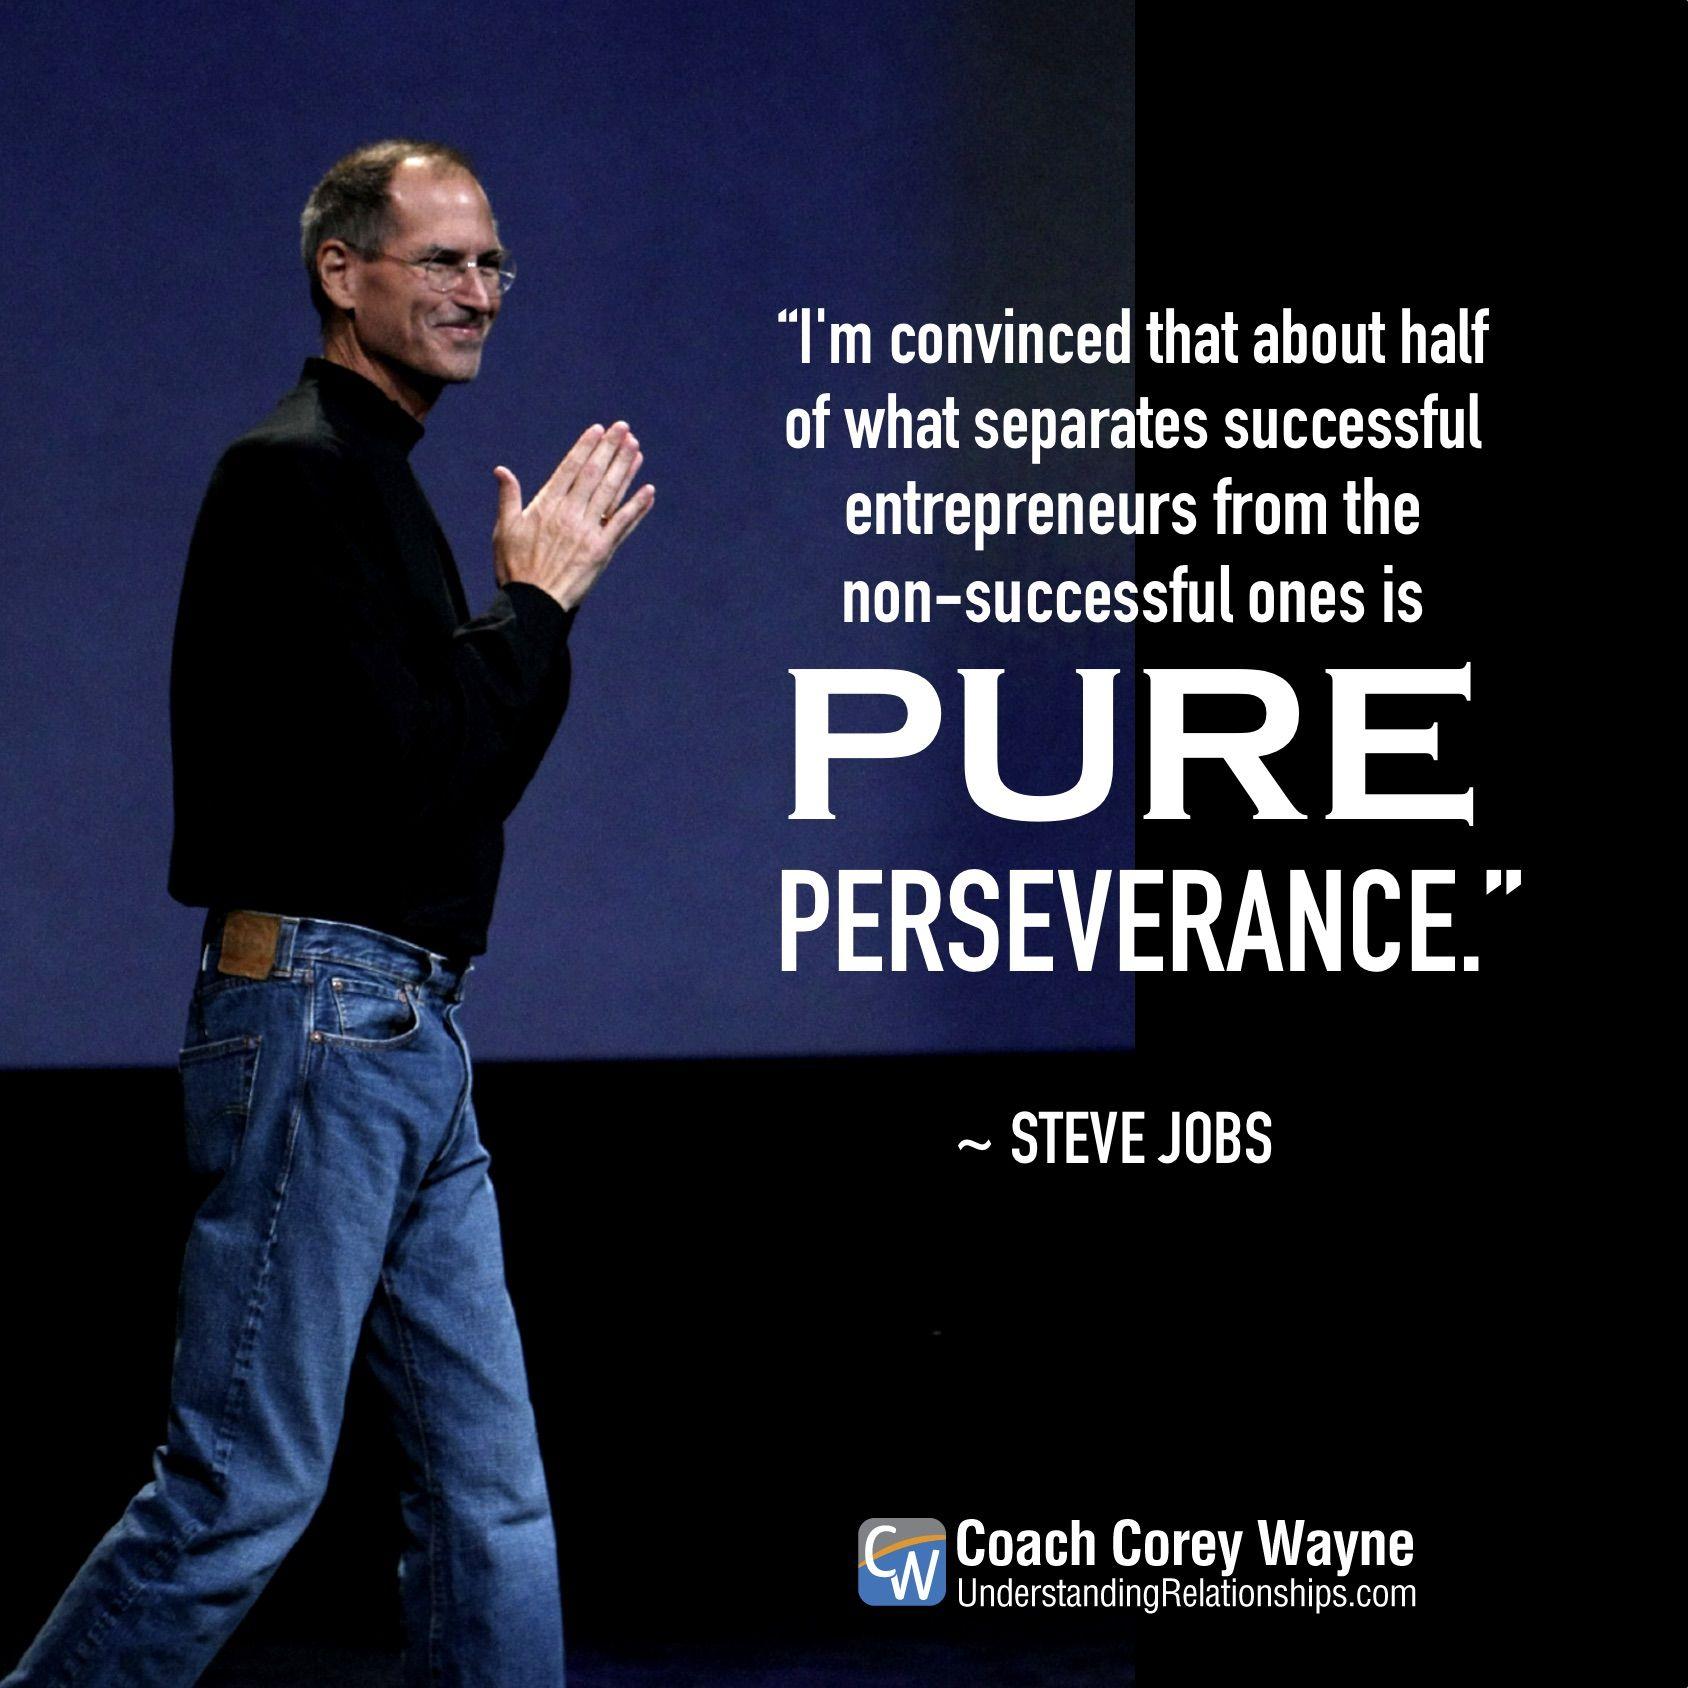 Persistence Motivational Quotes: #stevejobs #success #coaching #coachcoreywayne #confidence